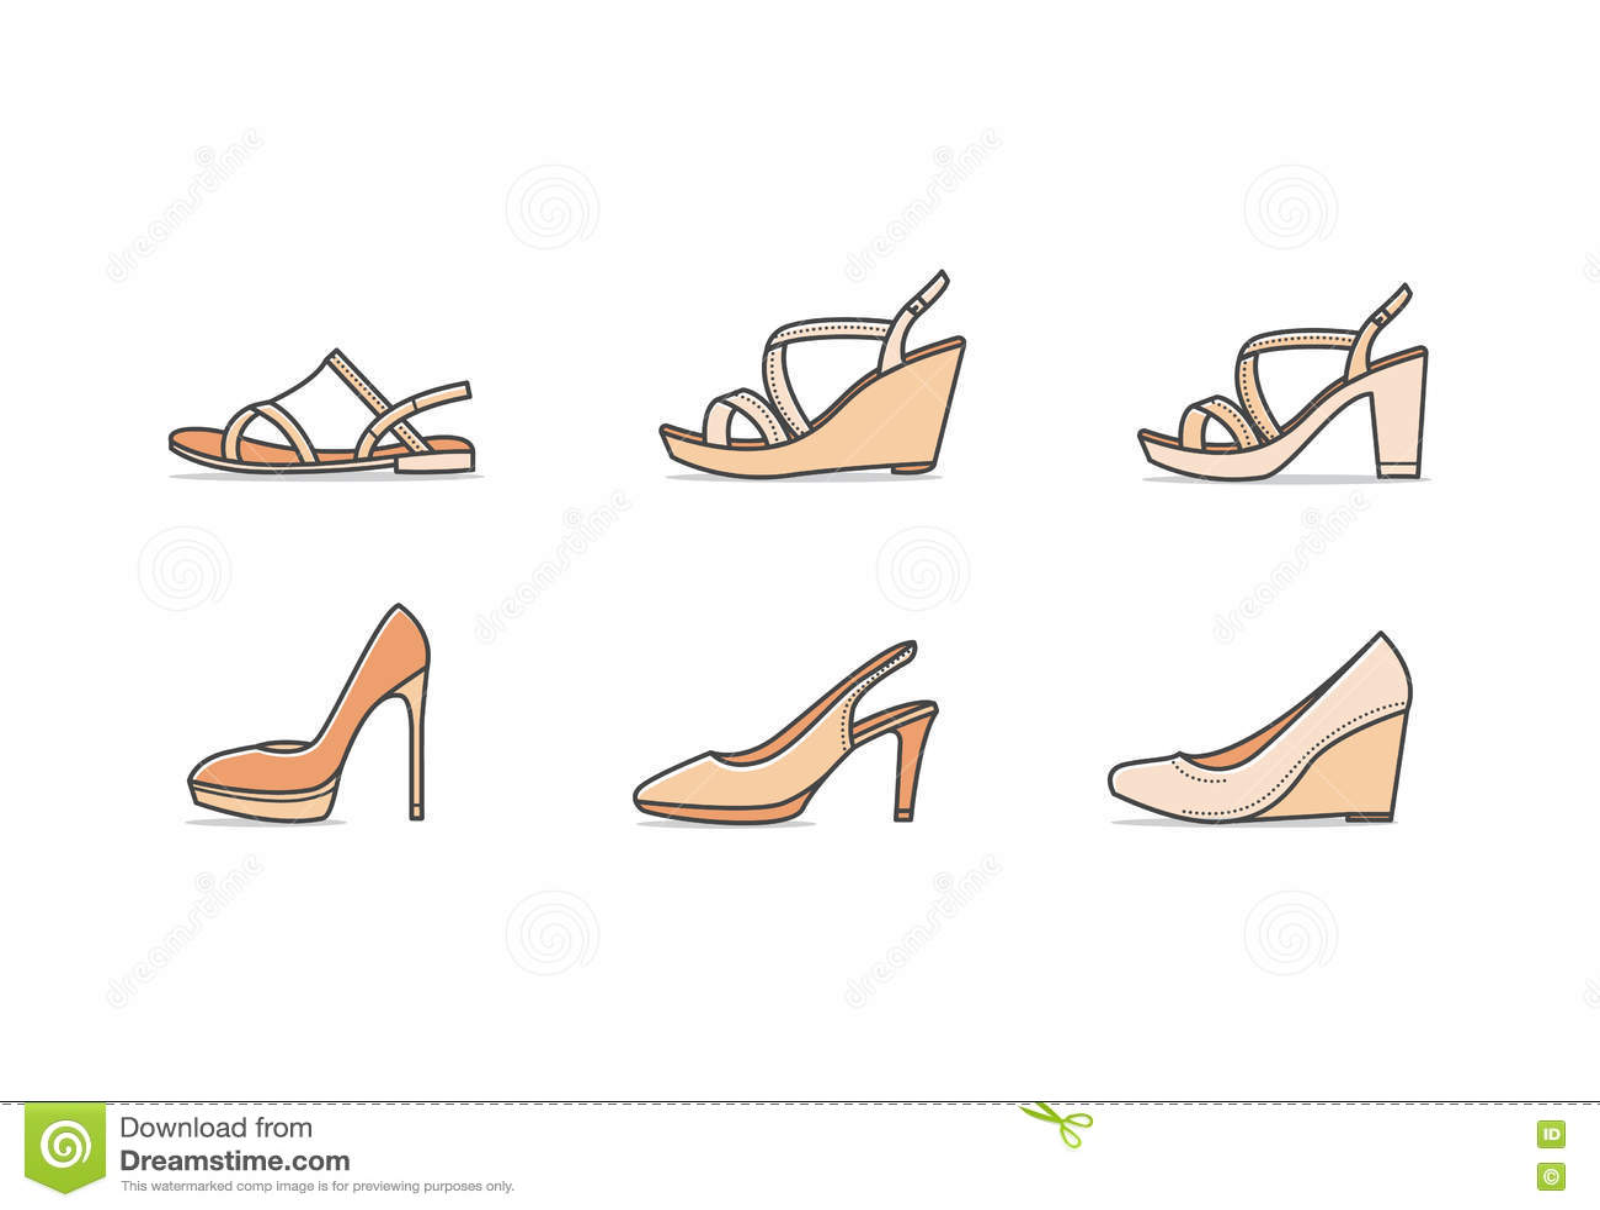 Illustration Vecteur De Femme Types Chaussures 6IbfymYv7g